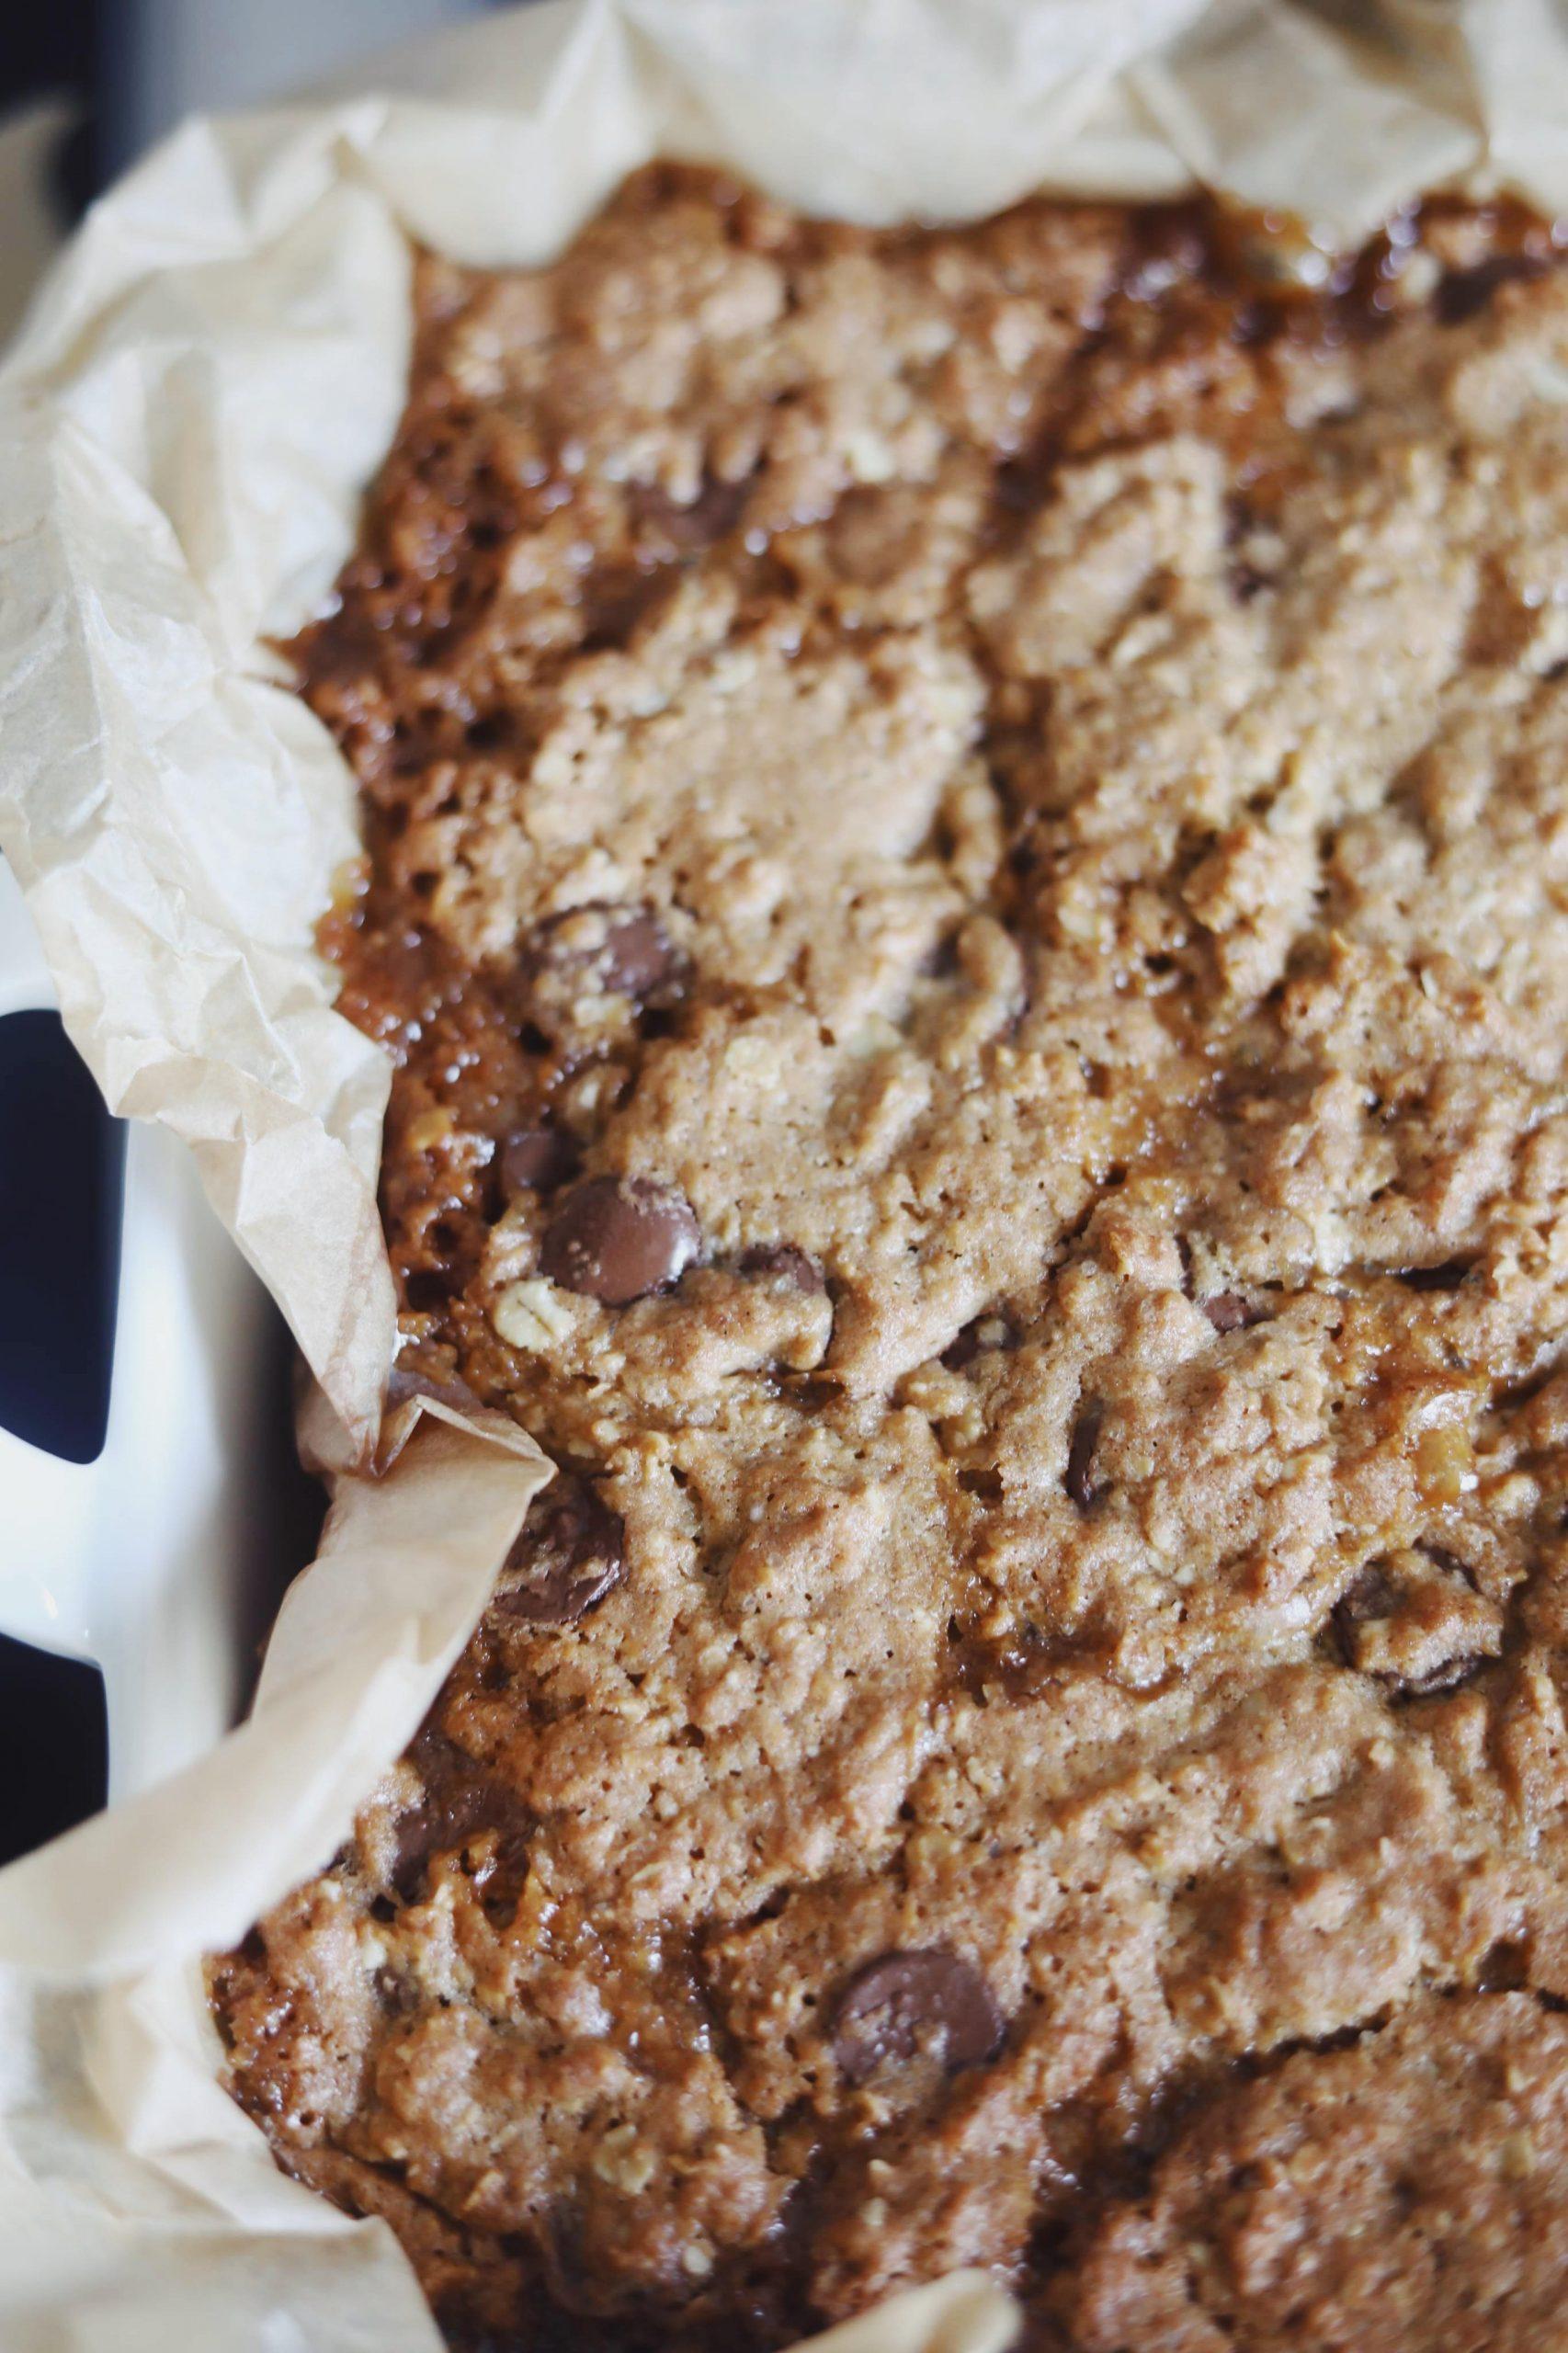 Havregrynsbarer med chokolade og karamel